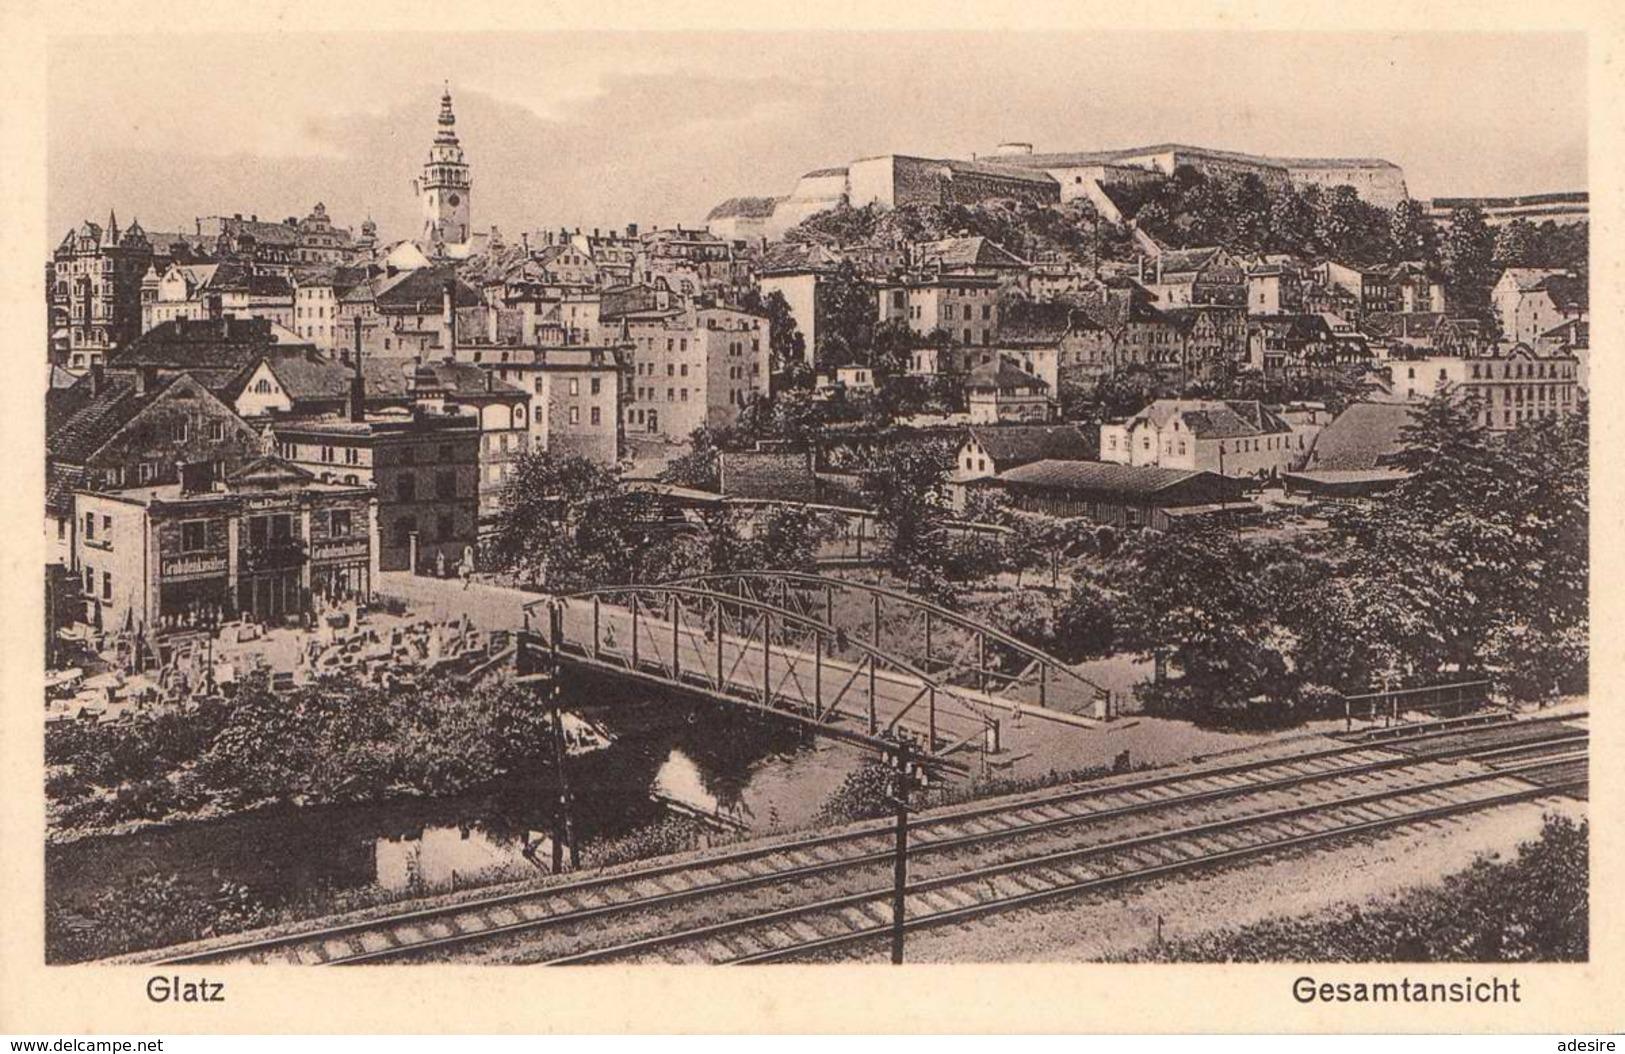 GLATZ (Kłodzko, Polen) - Gesamtansicht, 191? - Polen